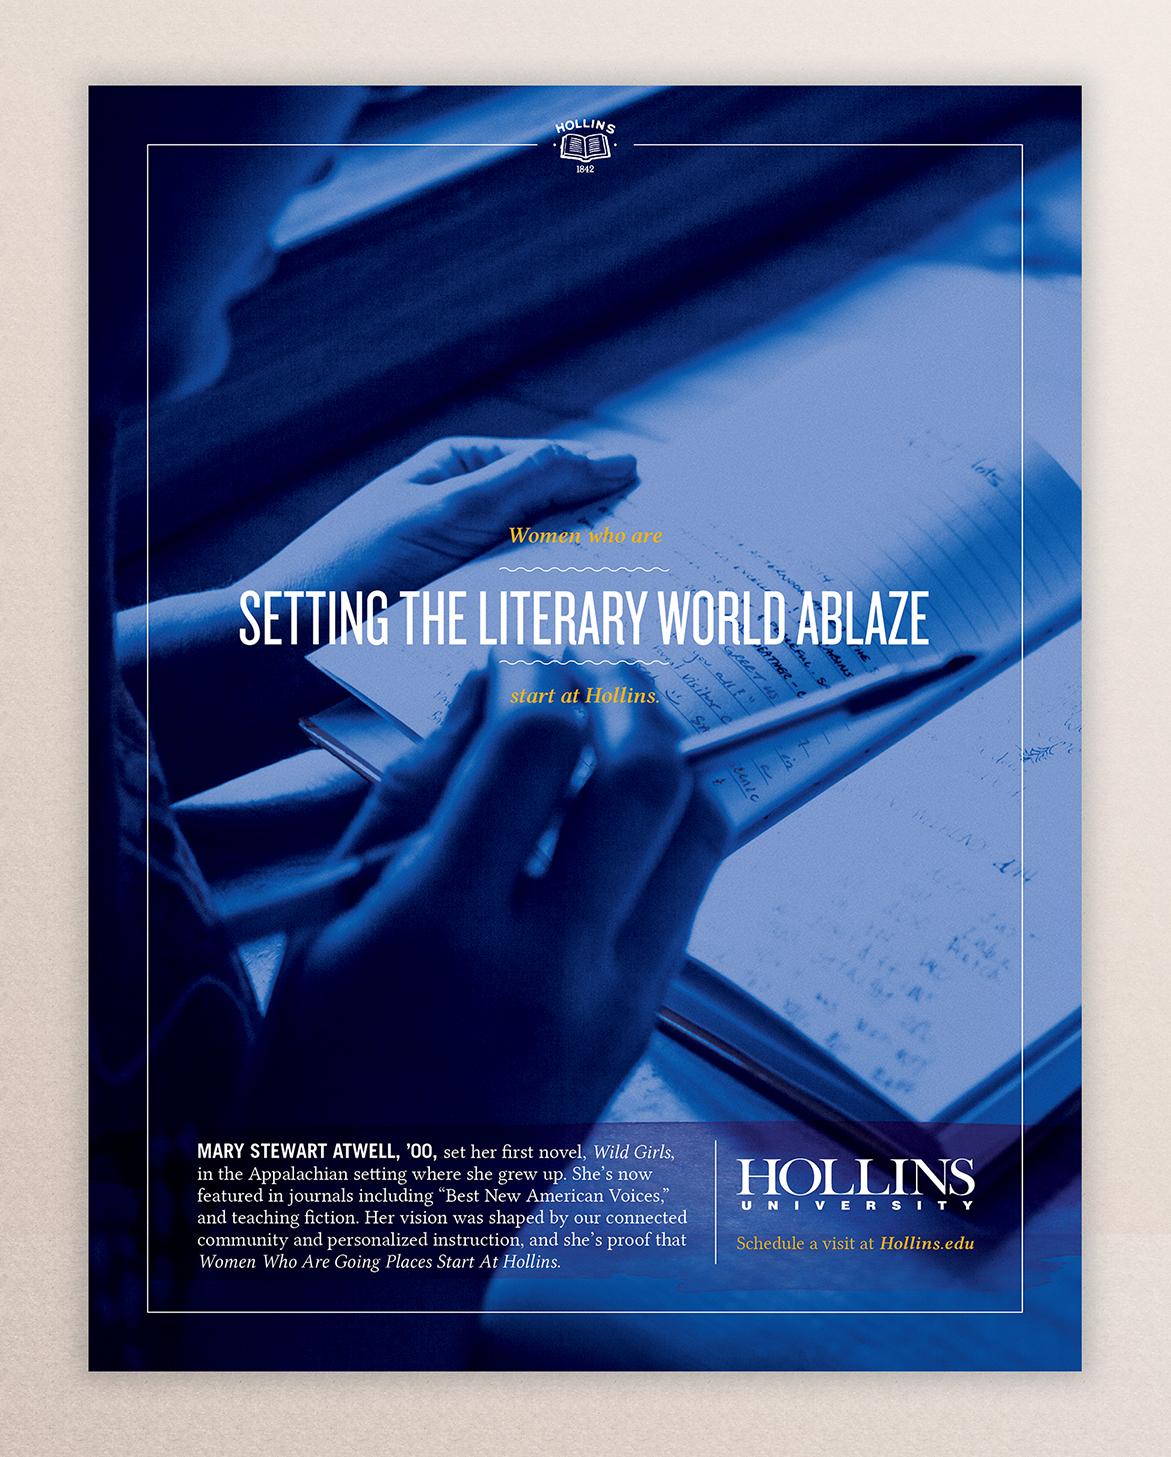 Hollins Print Ads – 4